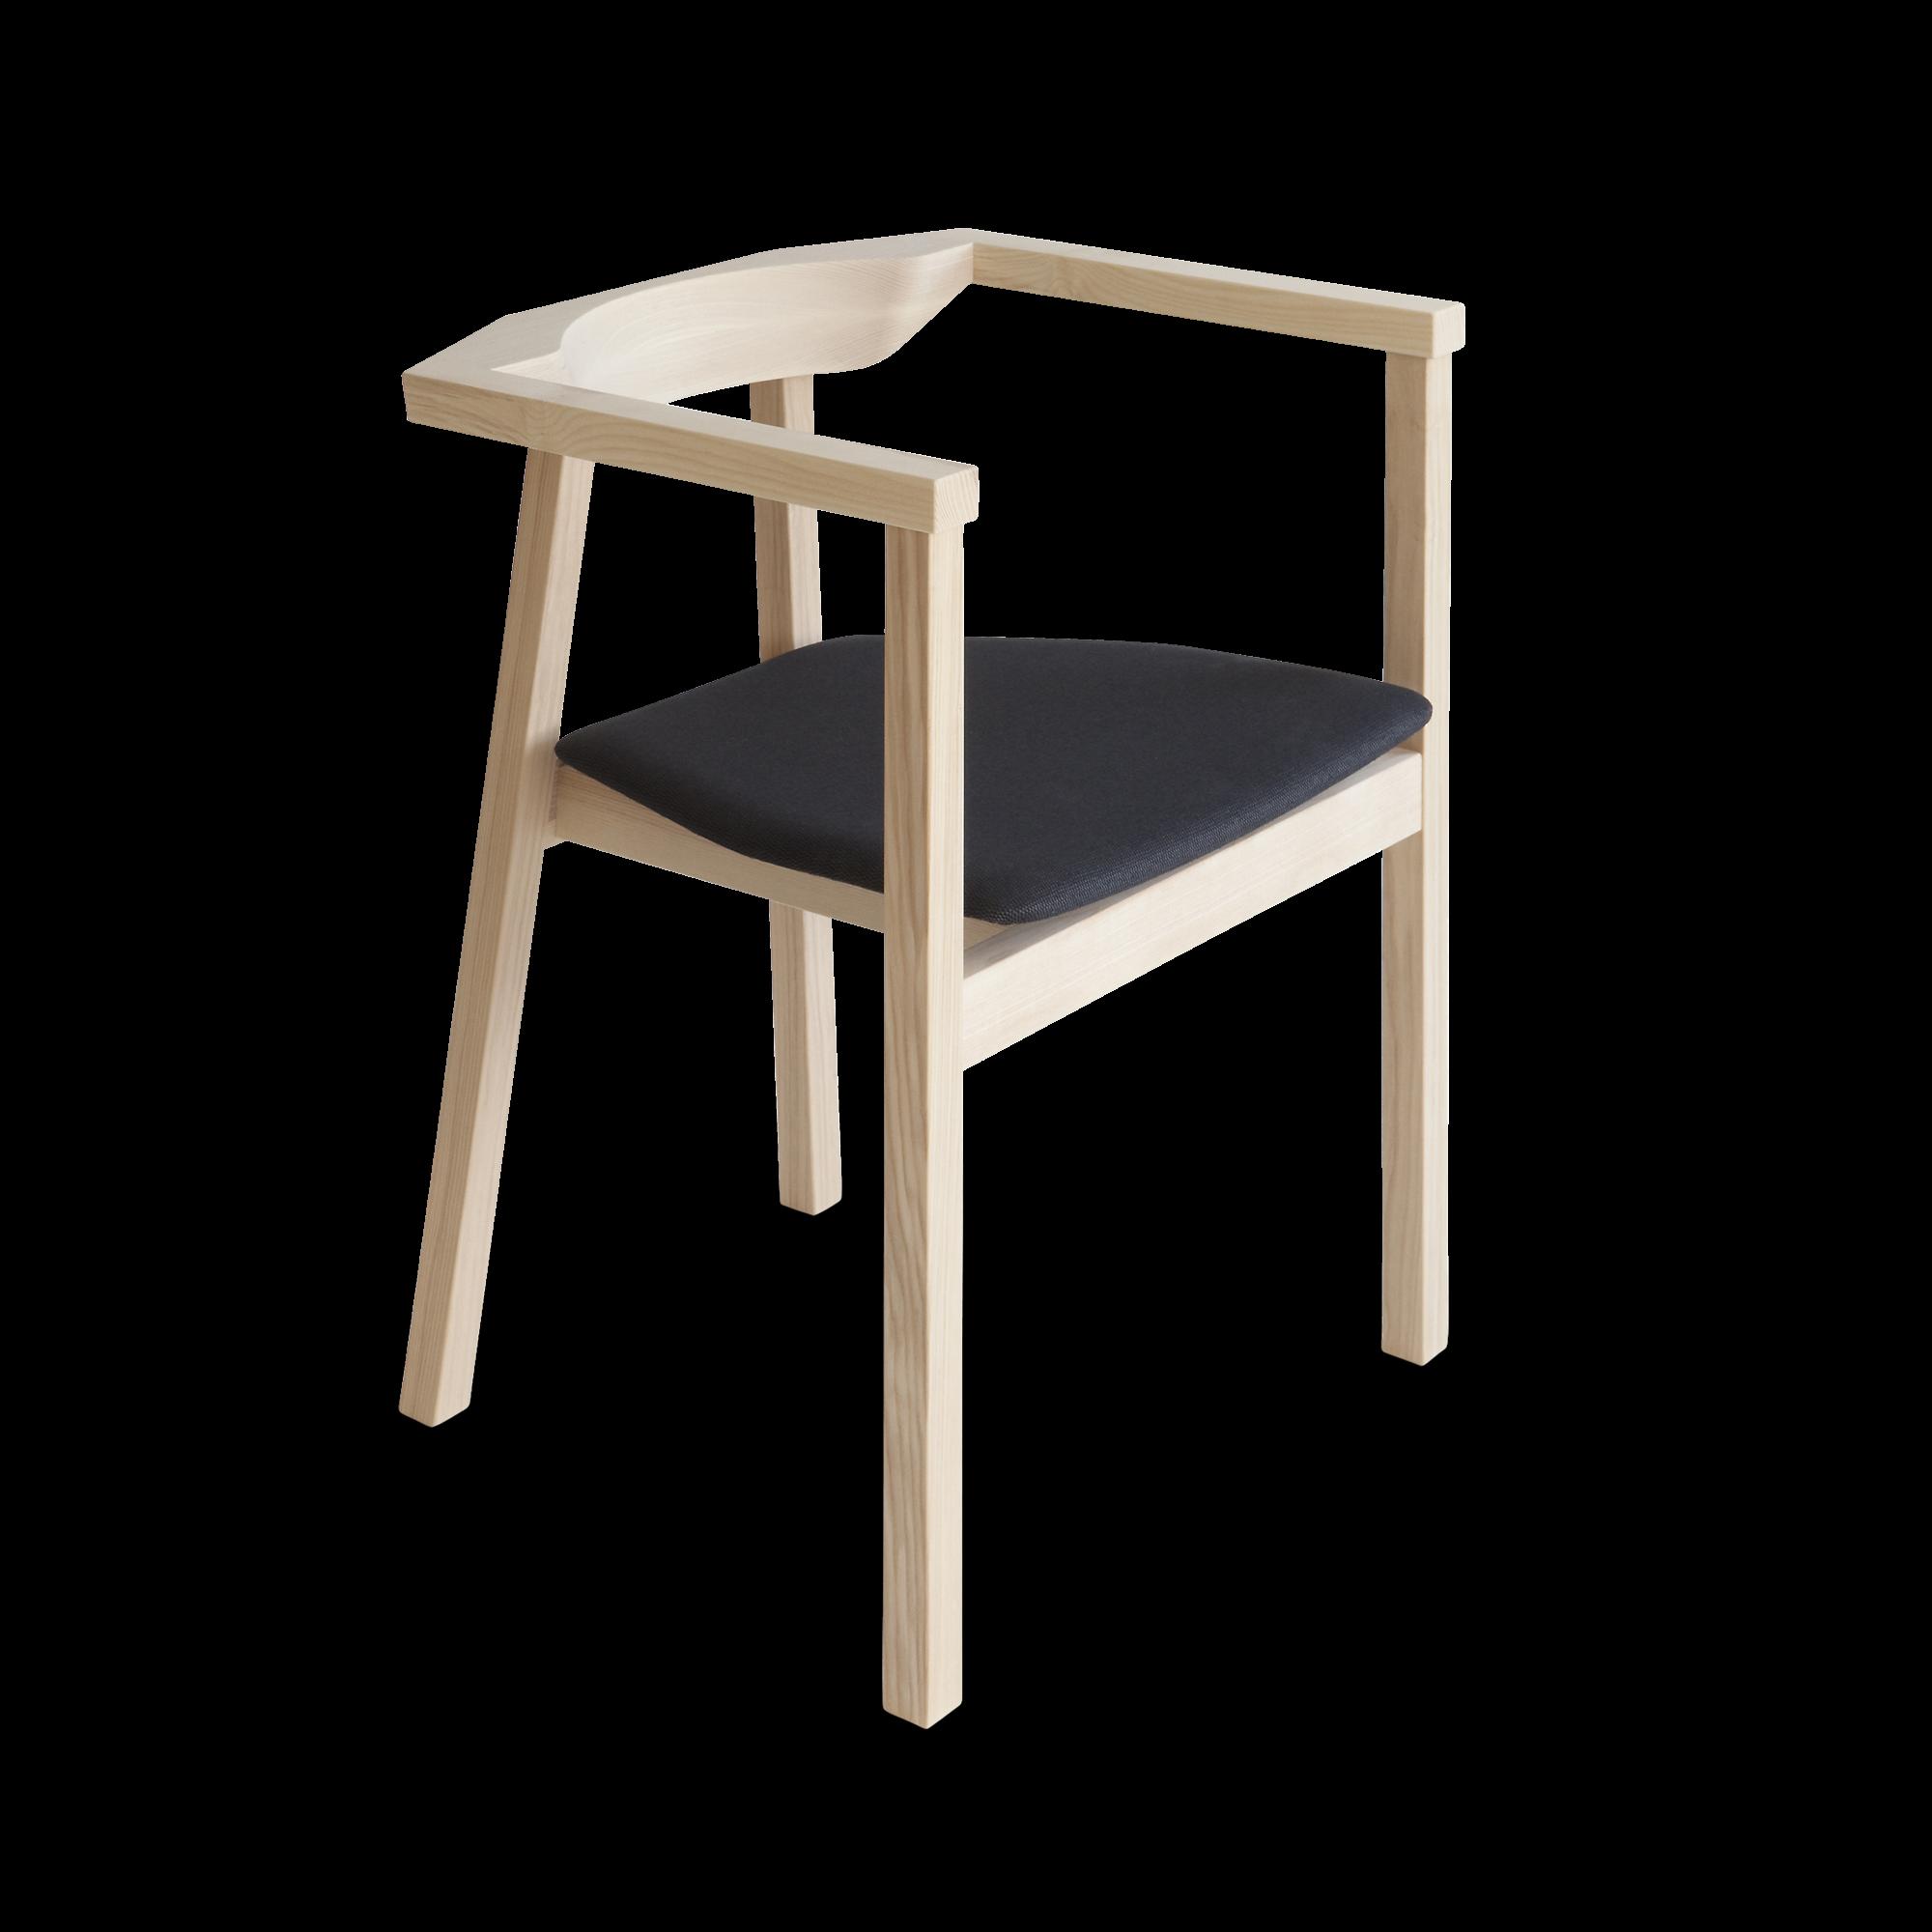 skandinavia-upsala-bdt1-chair